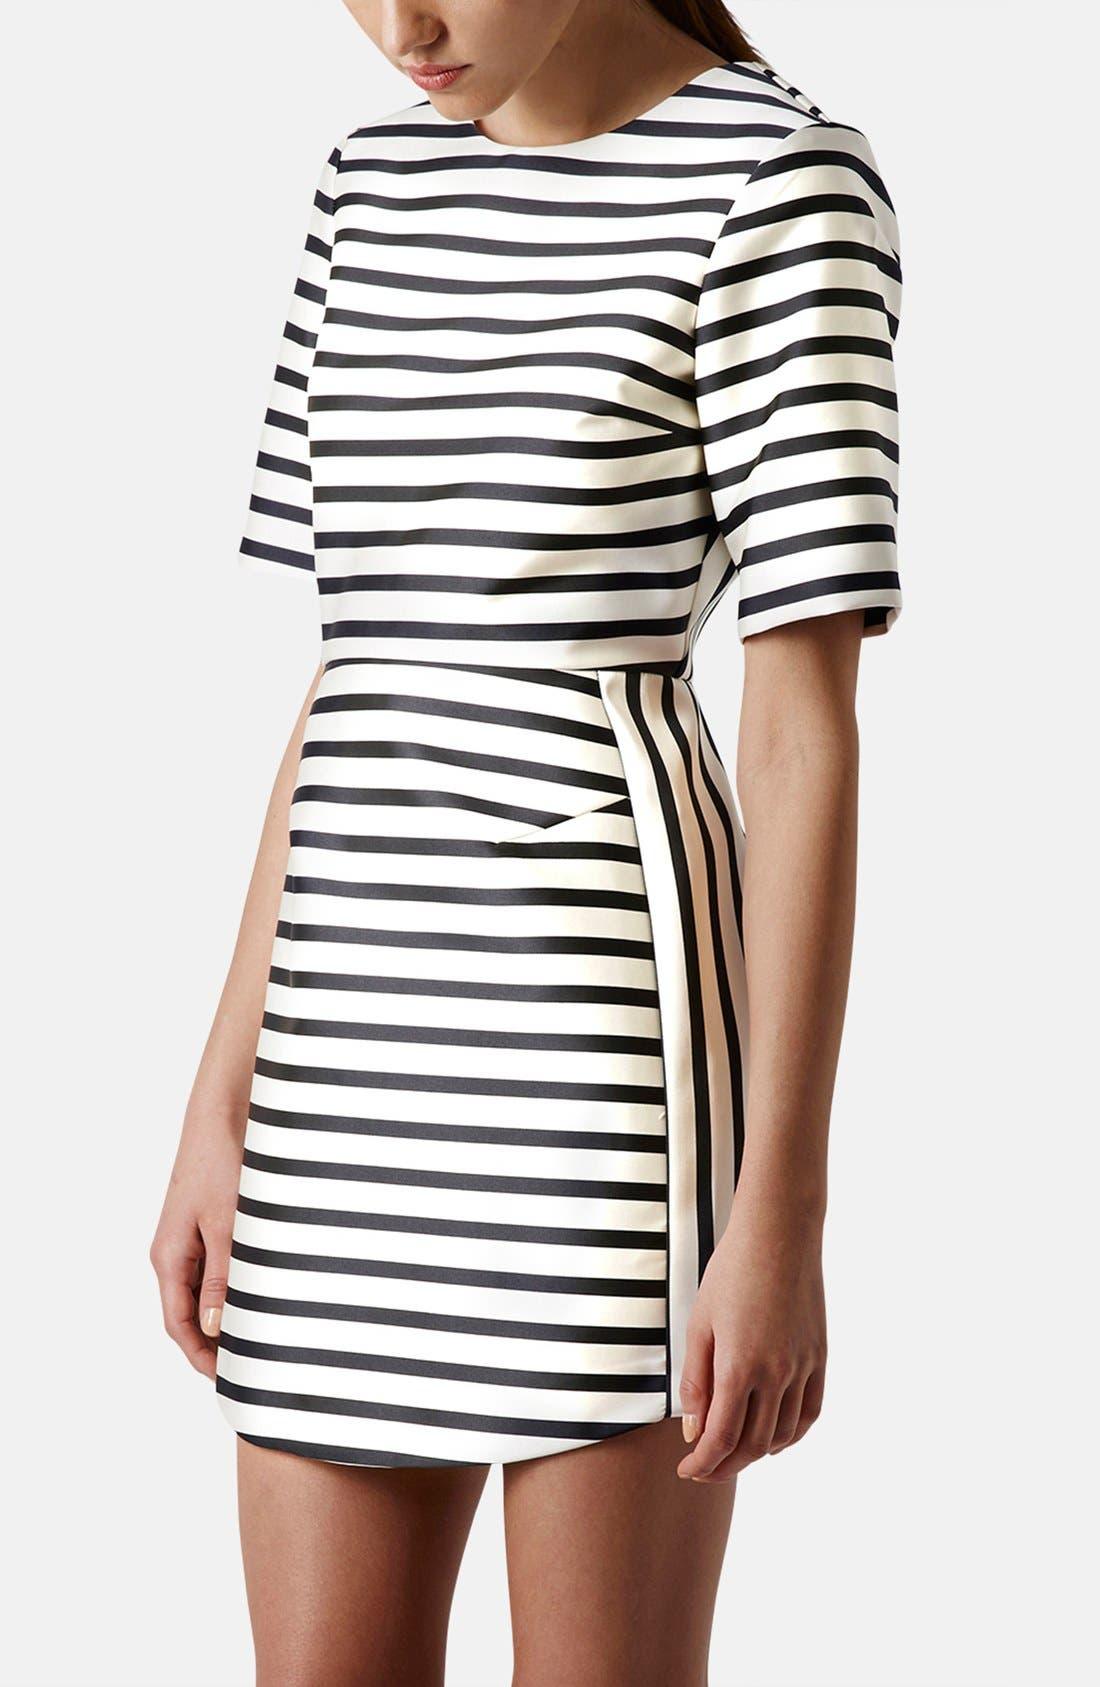 Alternate Image 1 Selected - Topshop Stripe Satin Dress